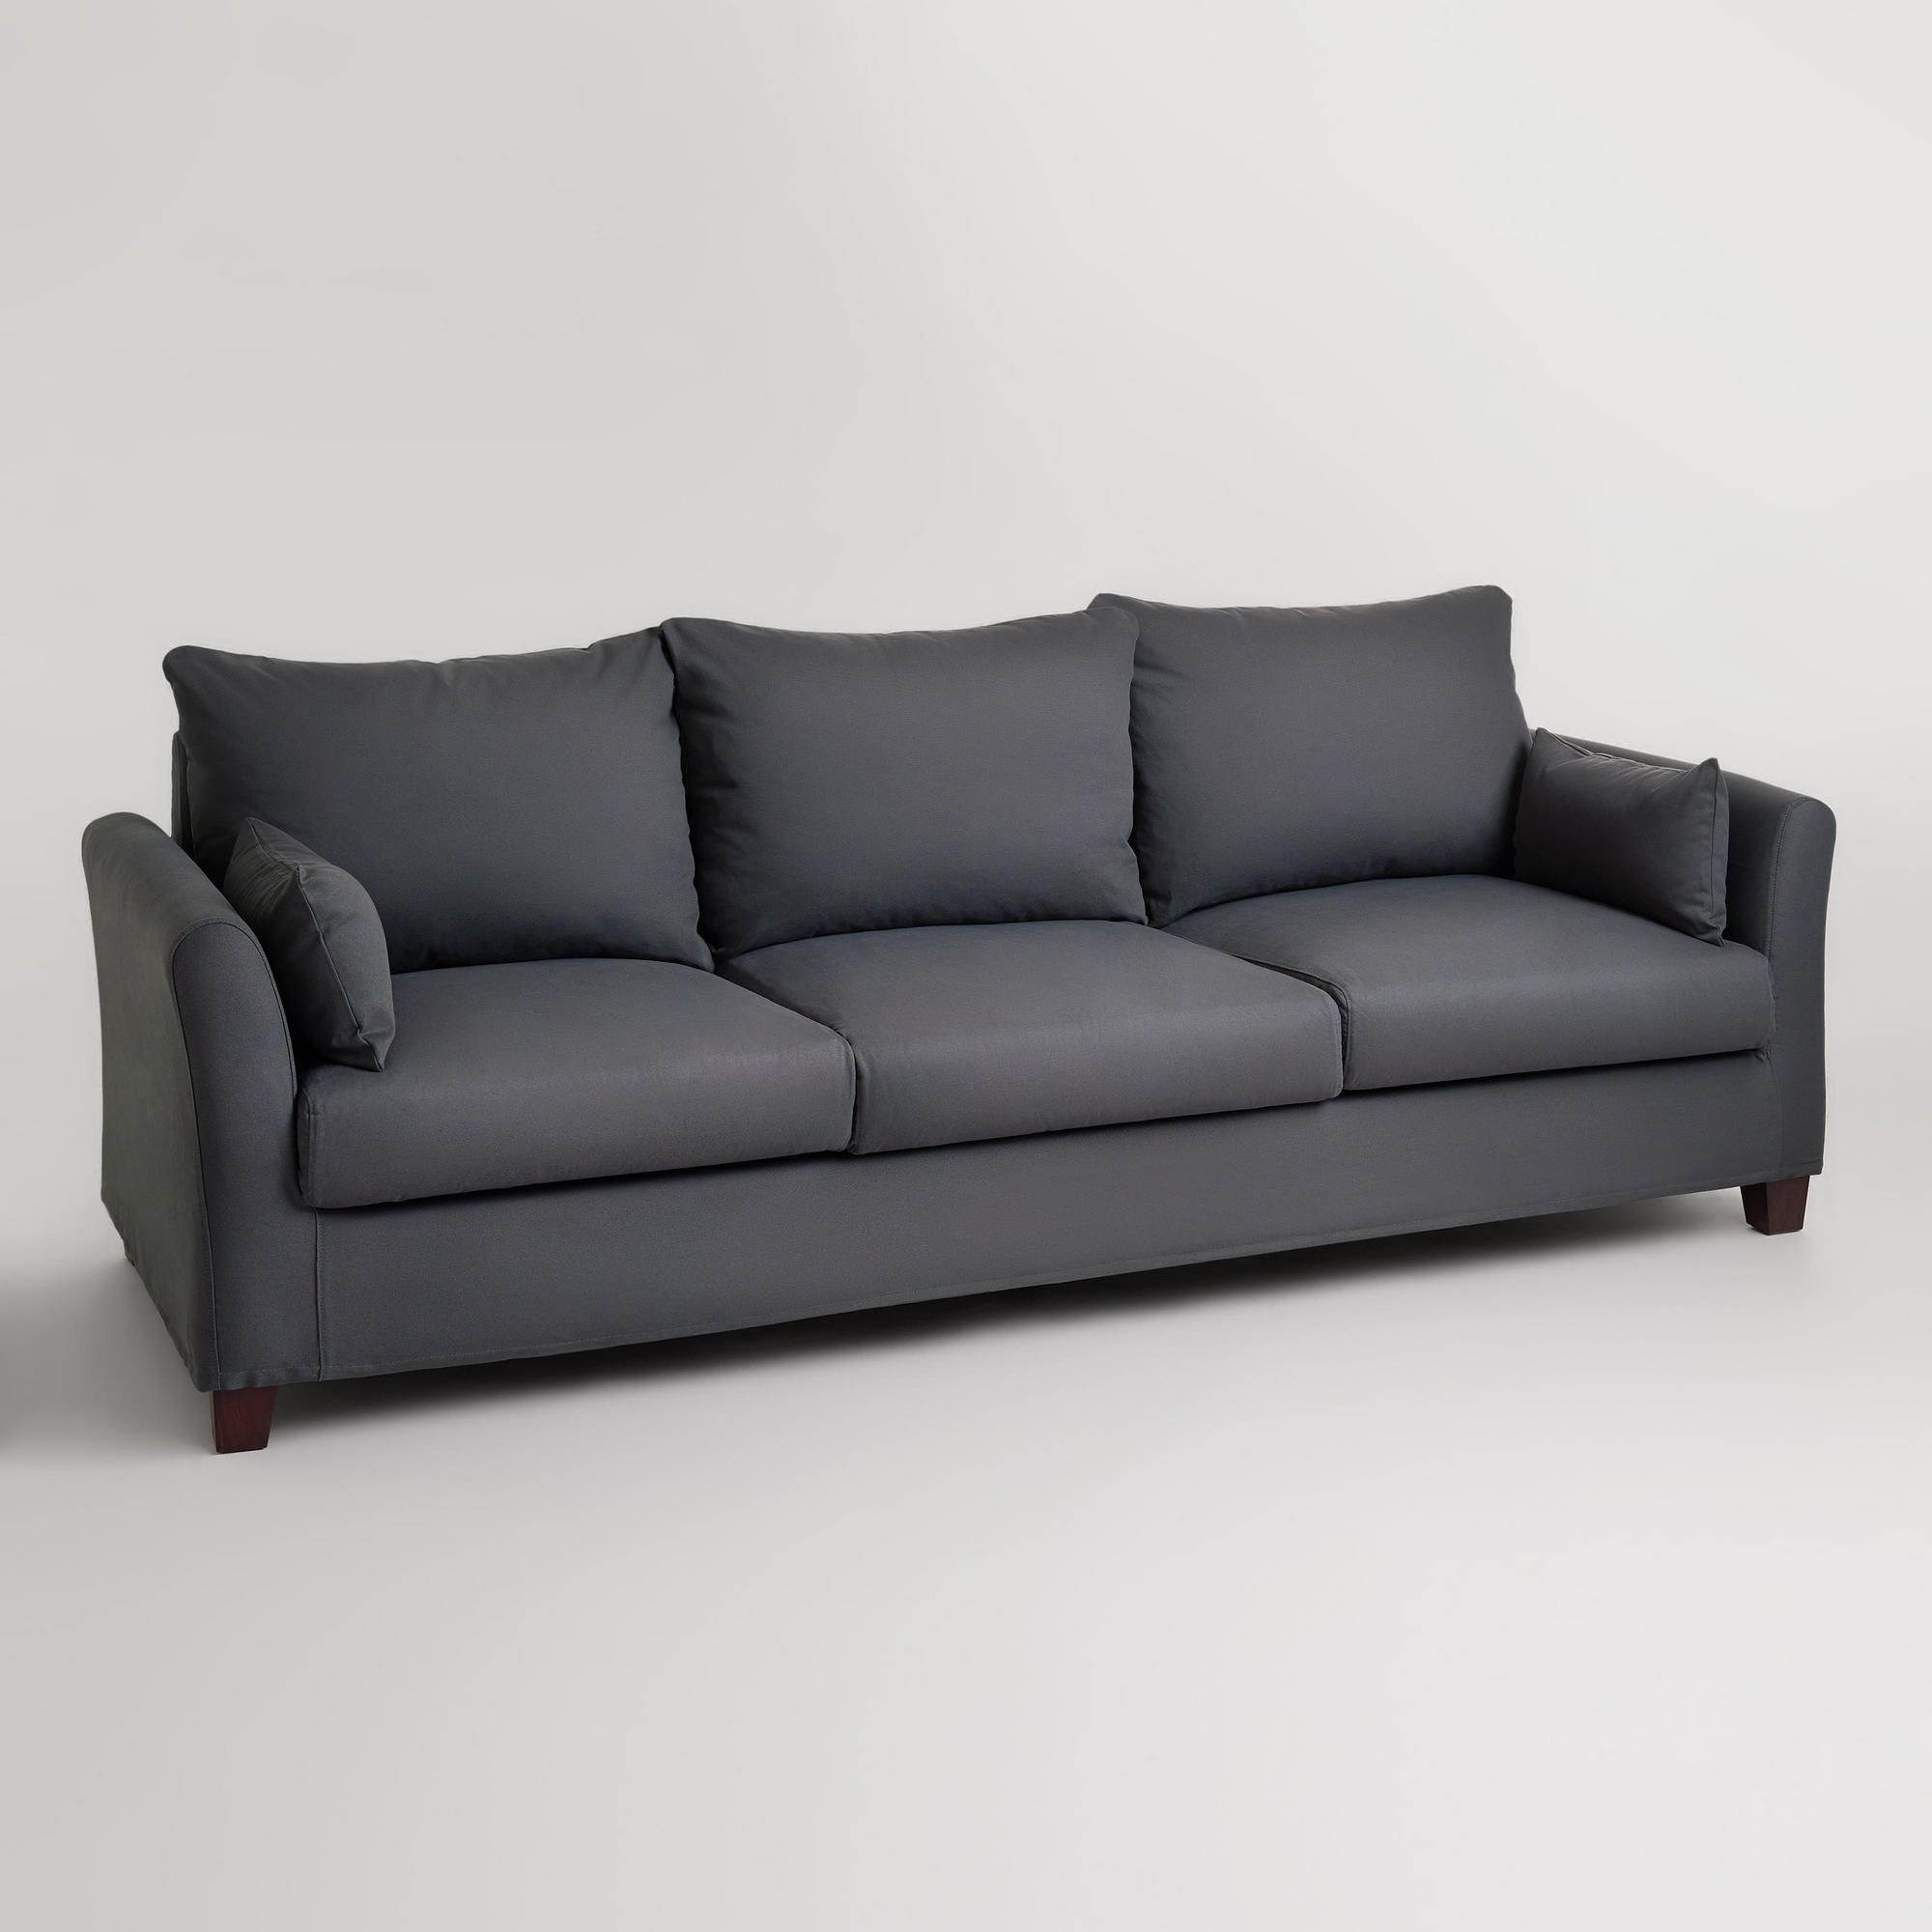 Luxe 2 Seat Sofa Slipcover Living Room Design Ideas Grey 3 Seater Covers Australia Velcromag